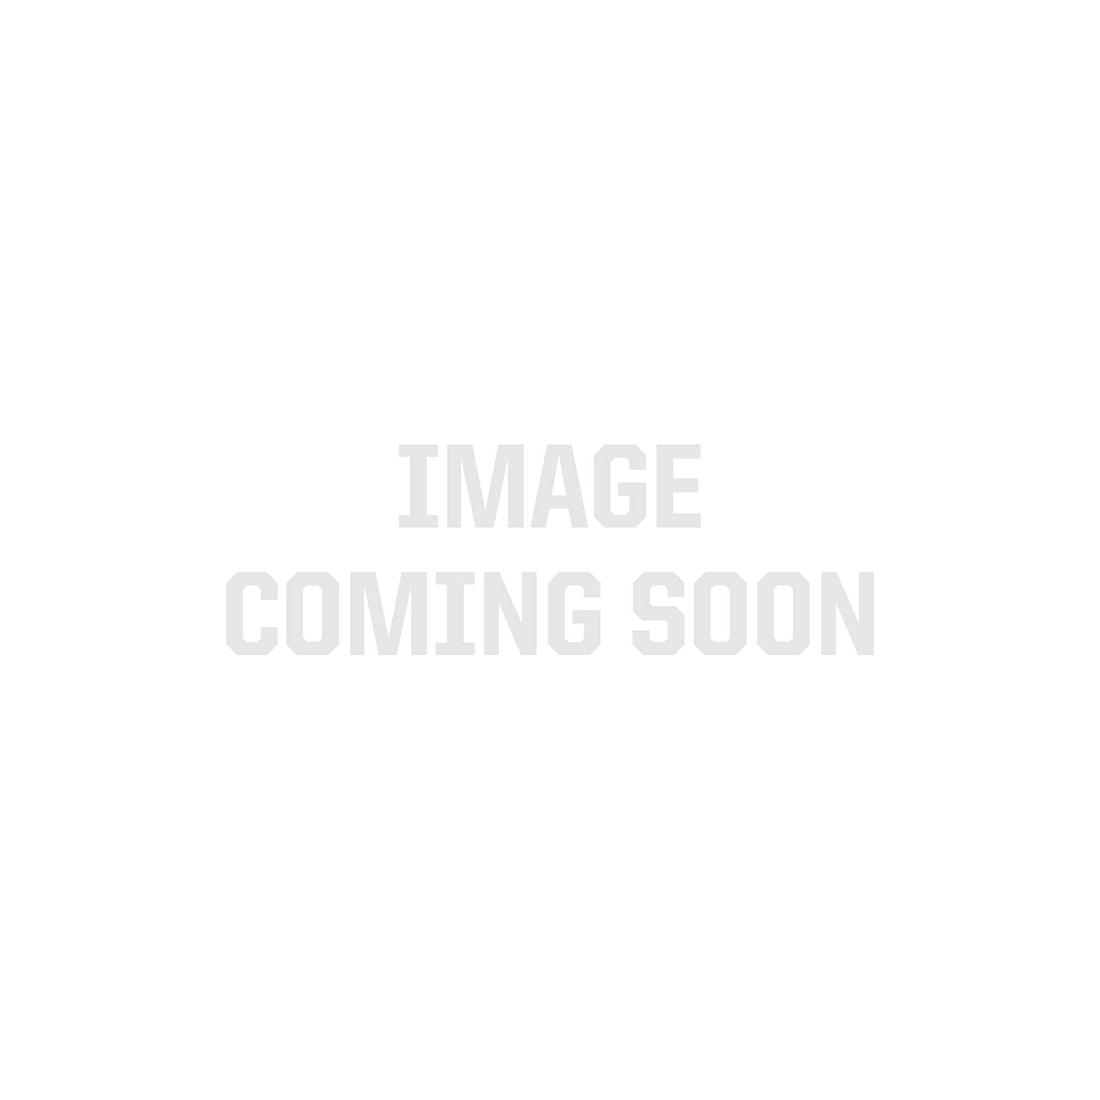 EL CL23 Oval Closet Rod Aluminum Channel (Anodized)